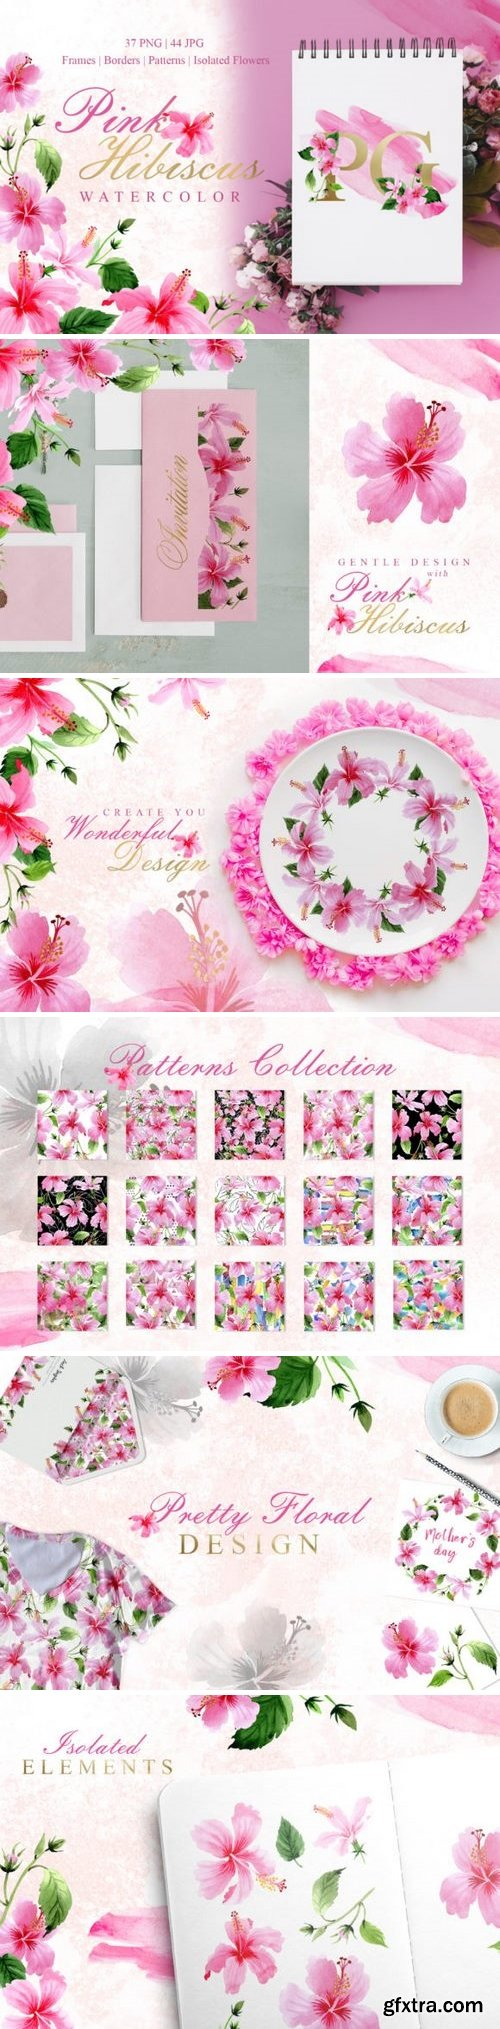 CM - Pink Hibiscus Watercolor png 3357013